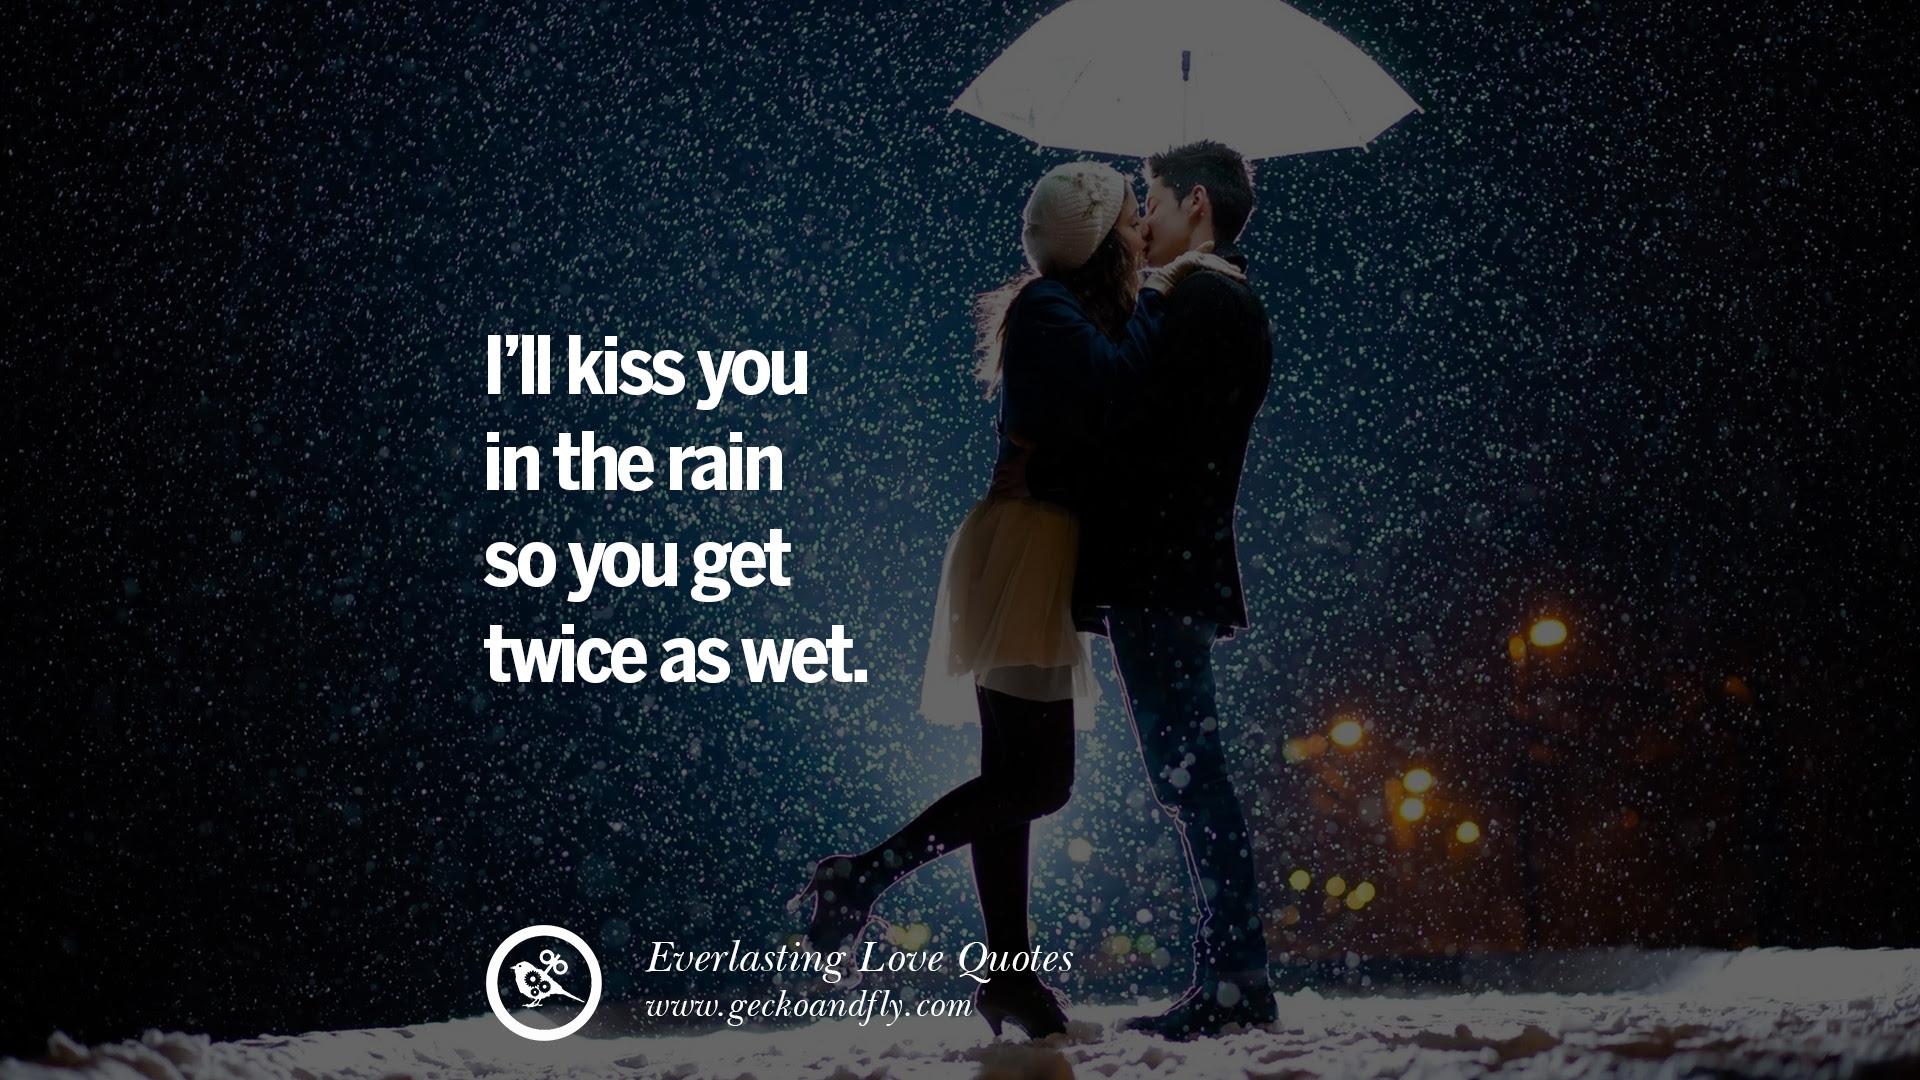 Romantic Couple In Rain Quotes American Go Association